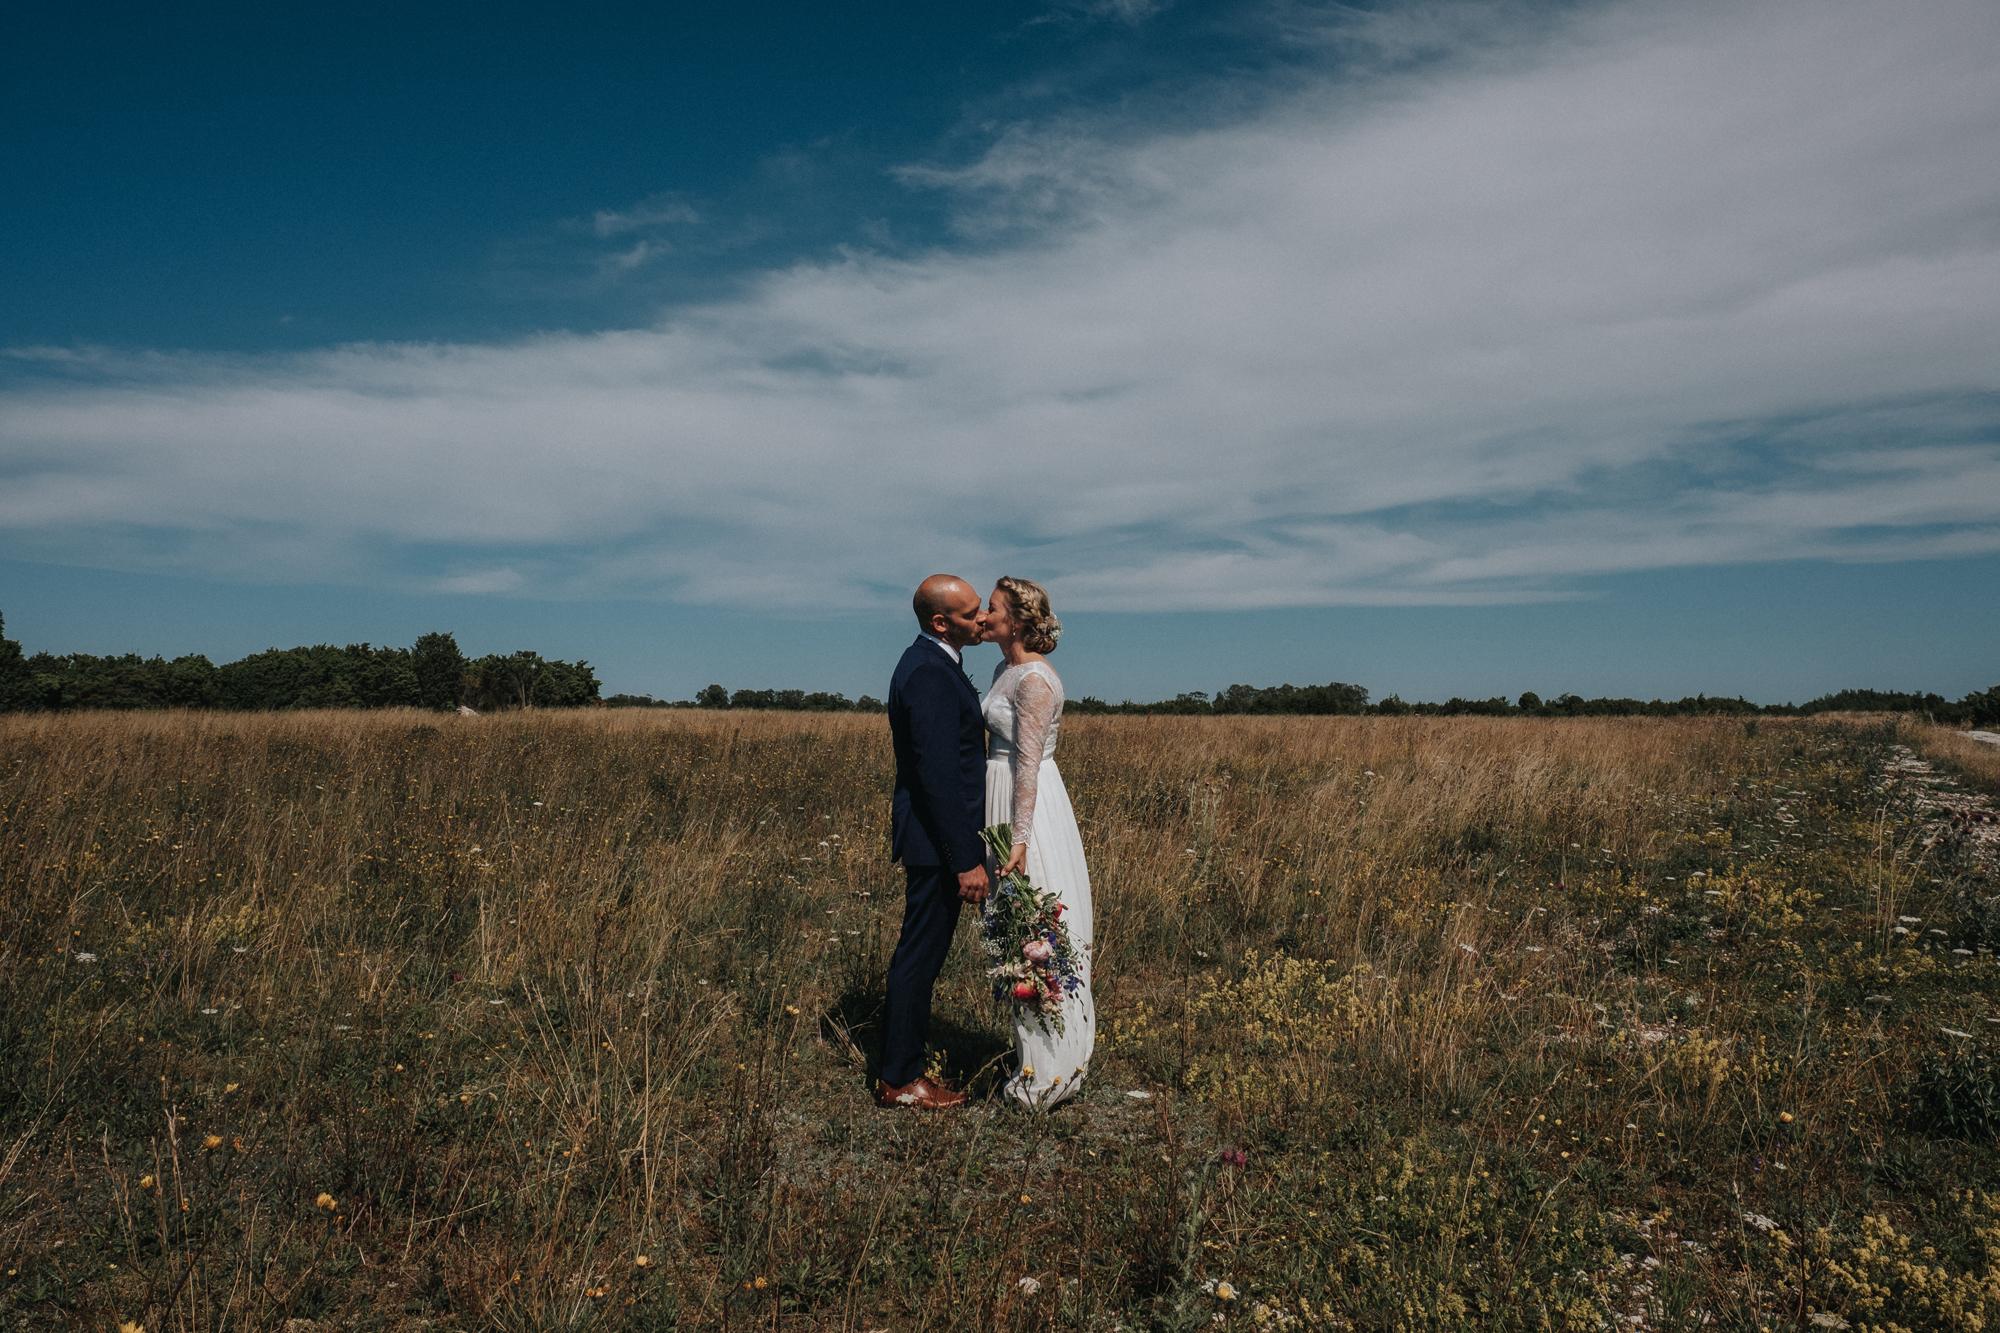 011-bröllopsfotograf-fårö-neas-fotografi.jpg